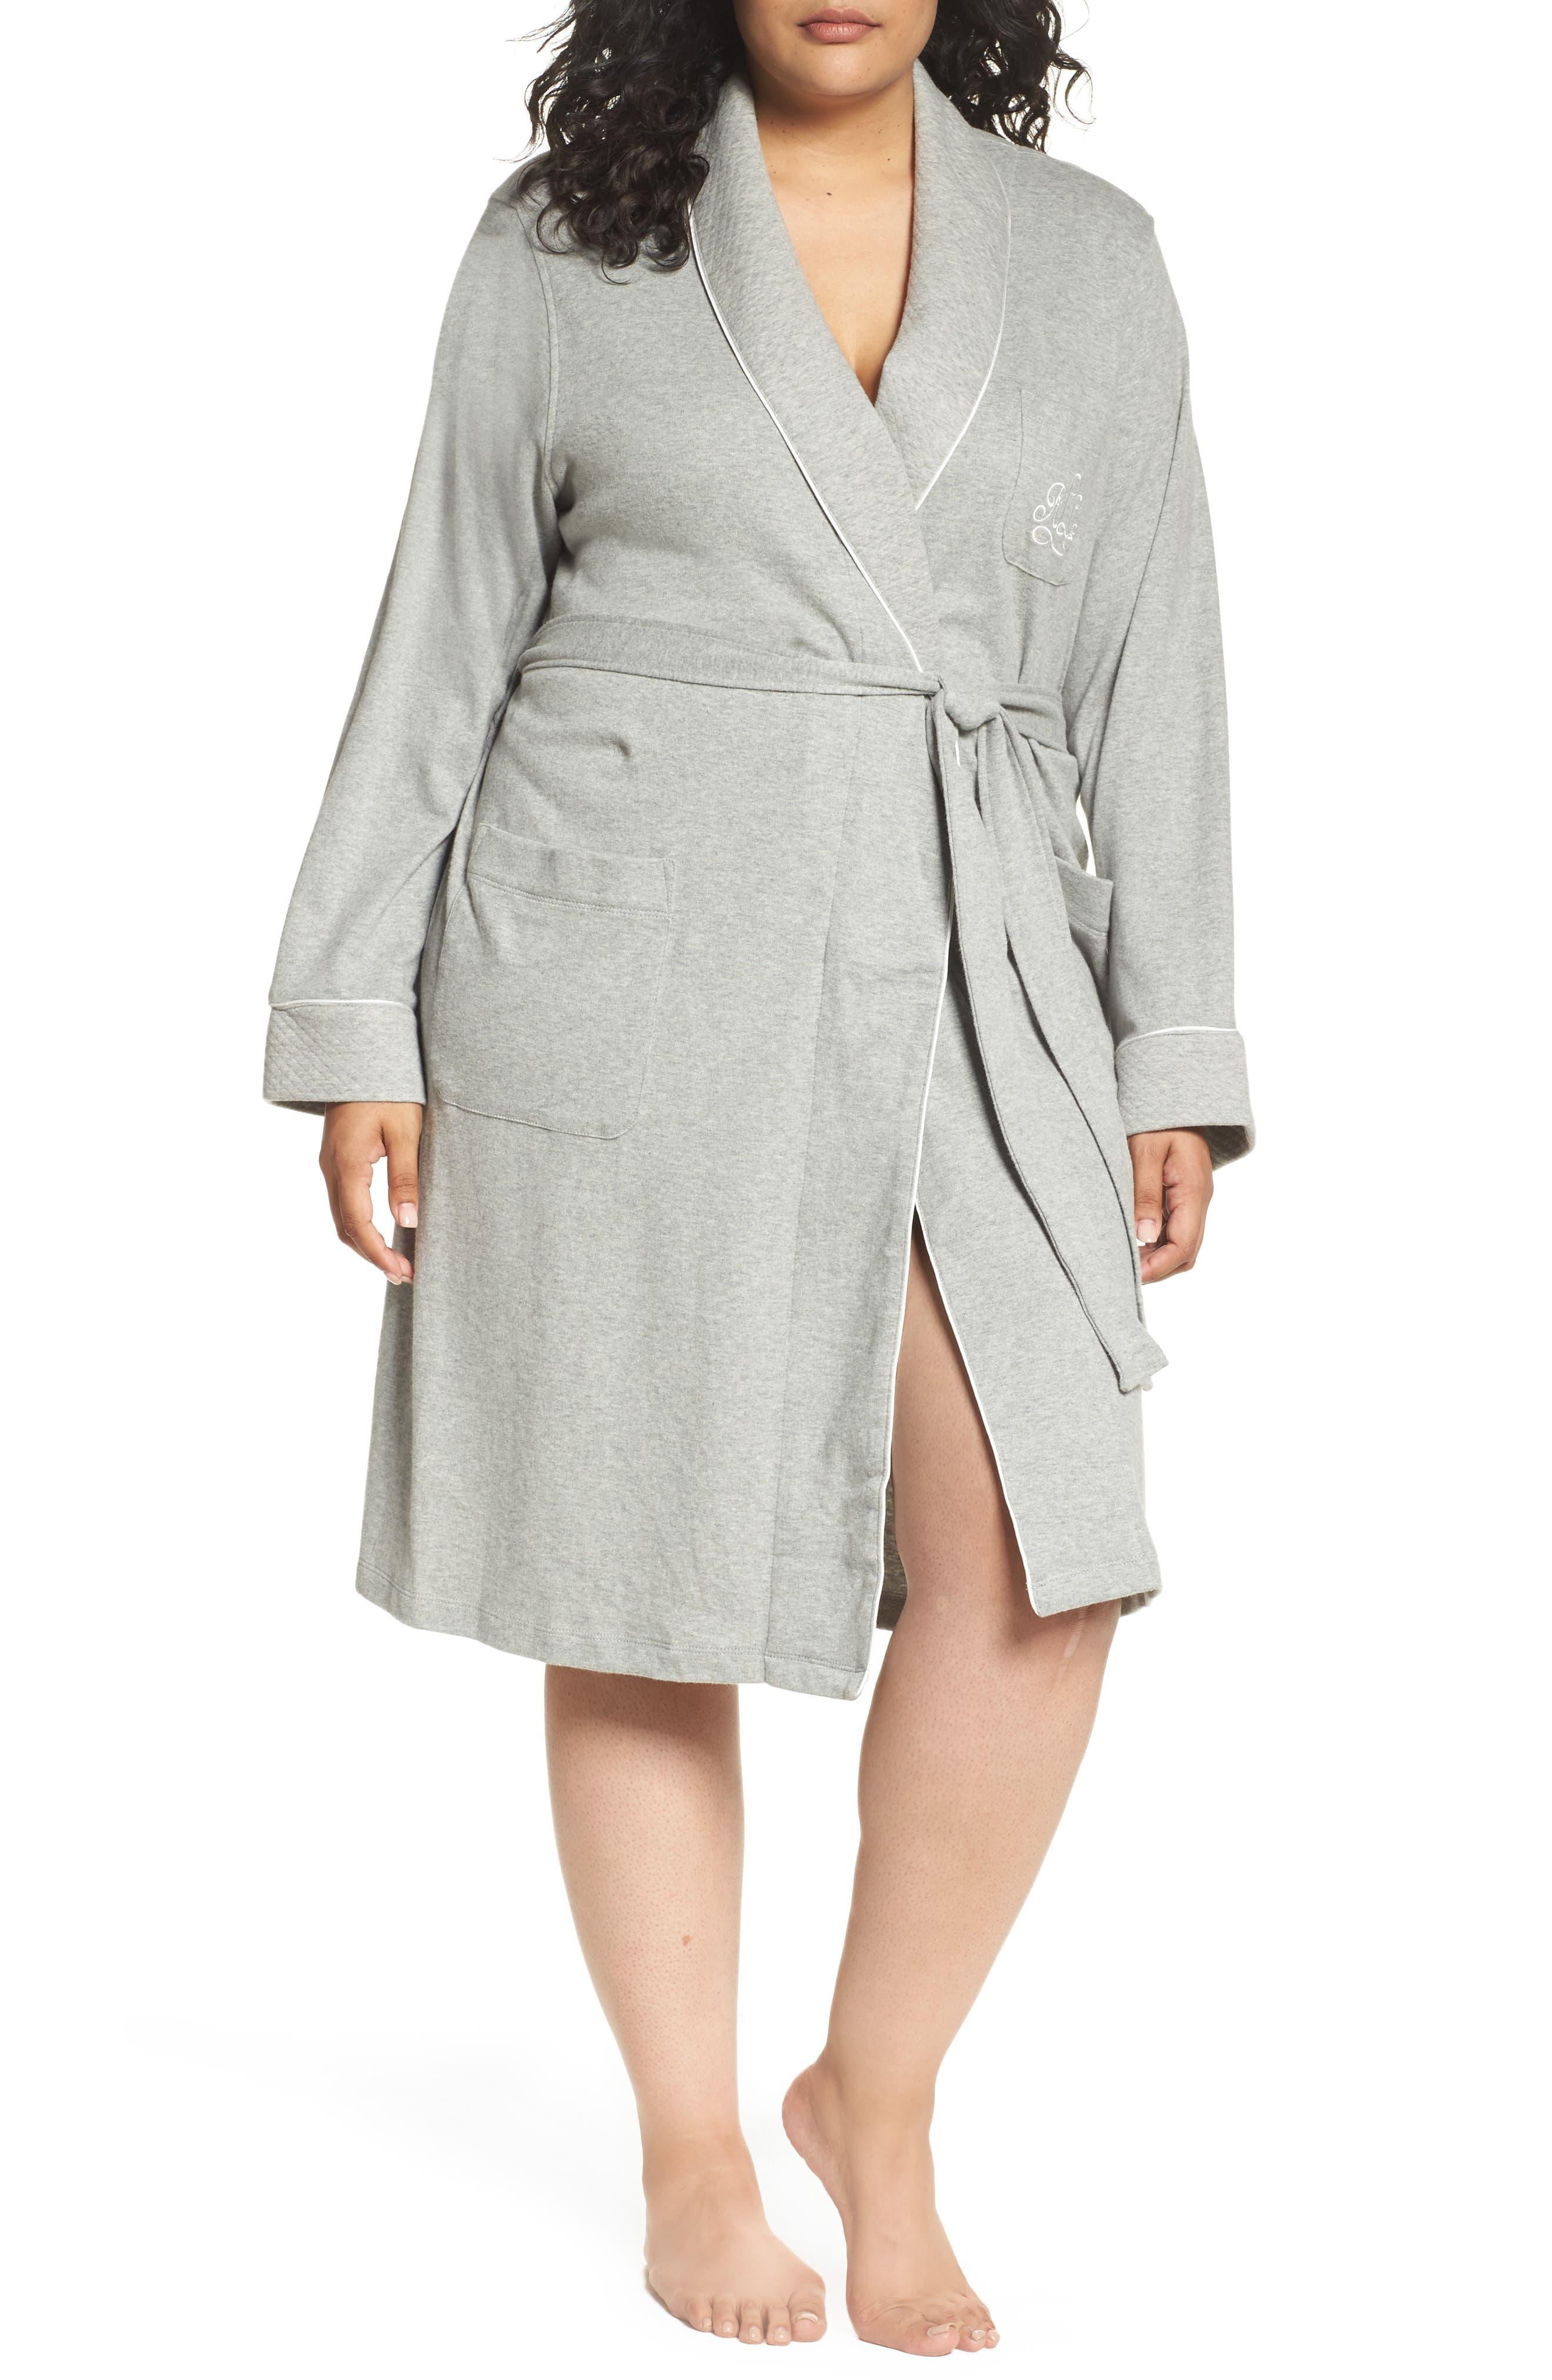 Alternate Image 1 Selected - Lauren Ralph Lauren Shawl Collar Robe (Plus Size) (Online Only)